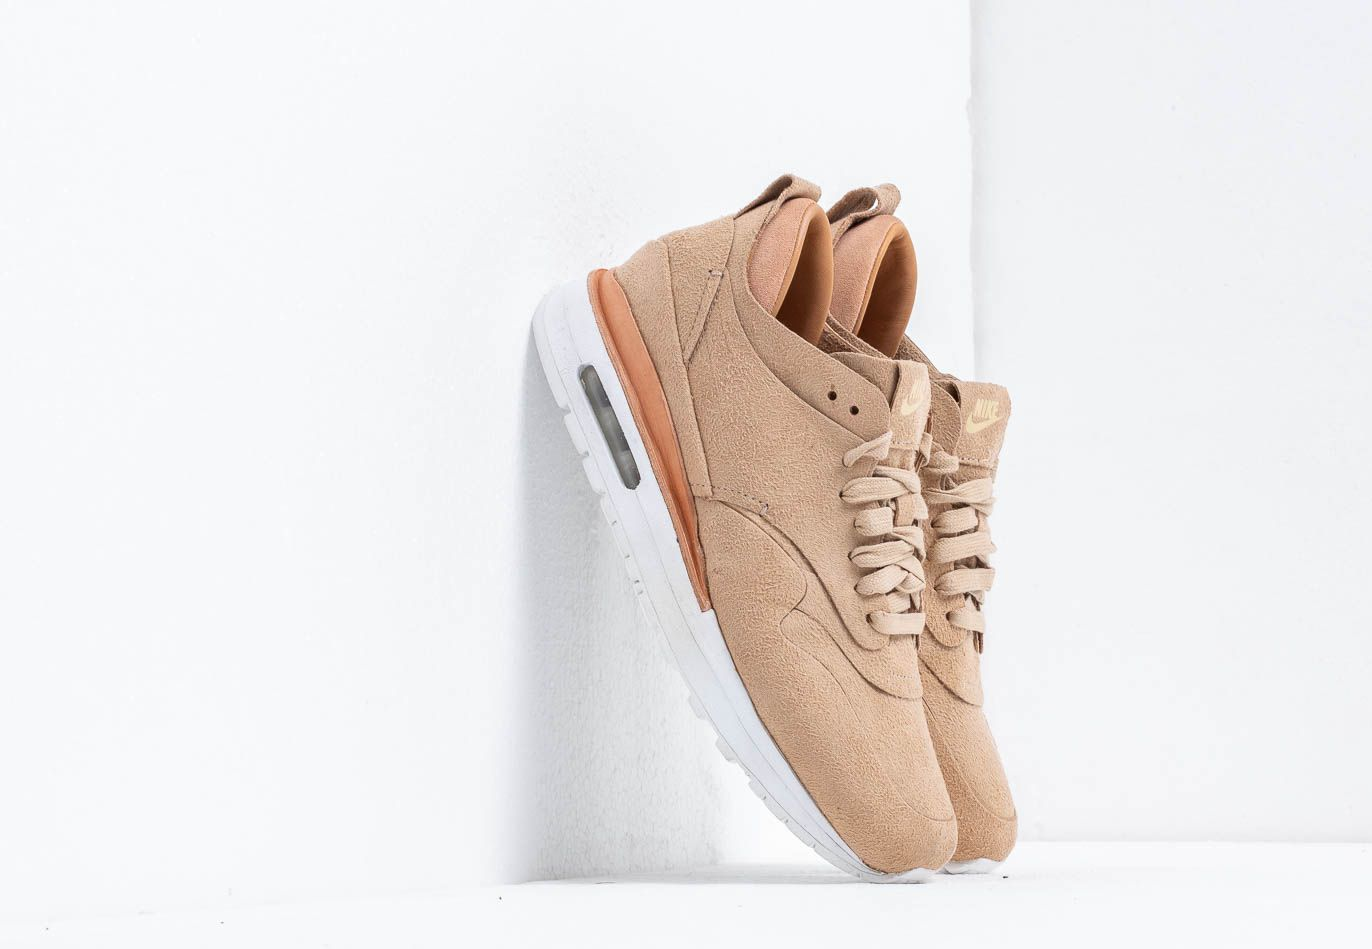 Nike Wmns Air Max 1 Royal Linen/ Linen-Summit White